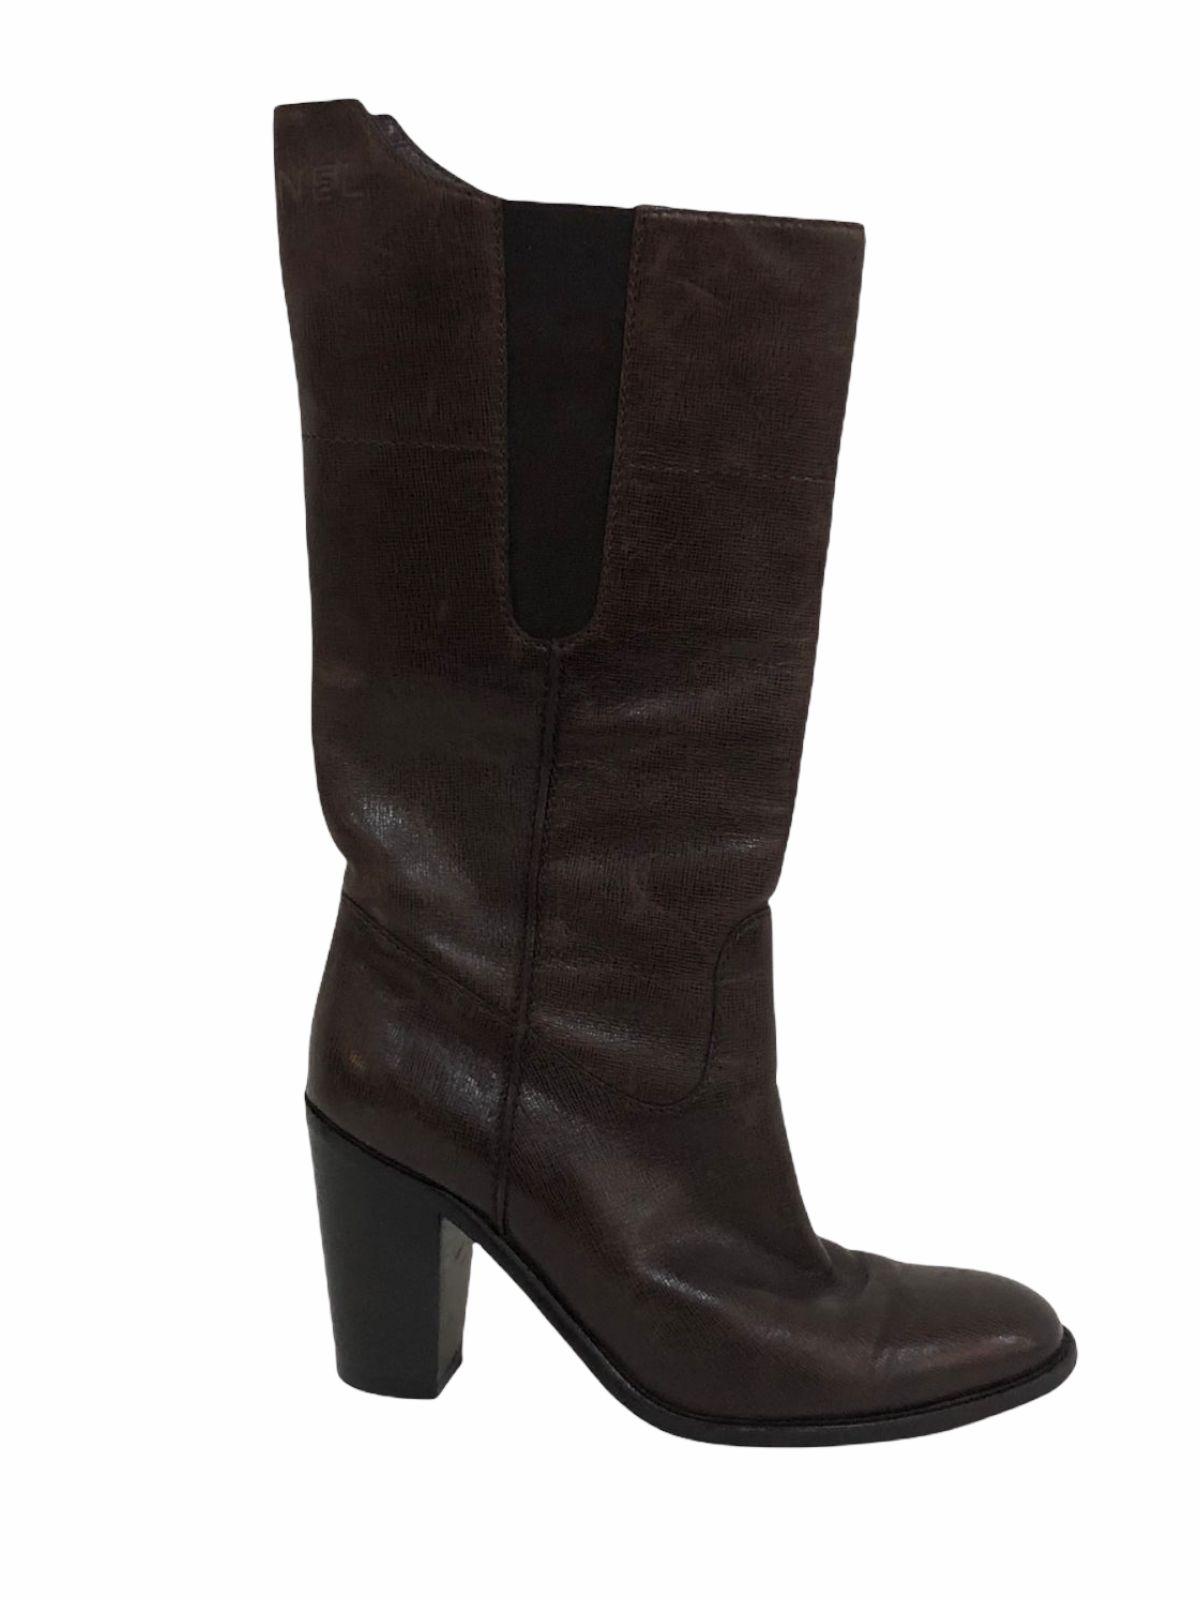 Bota Chanel Leather Marrom